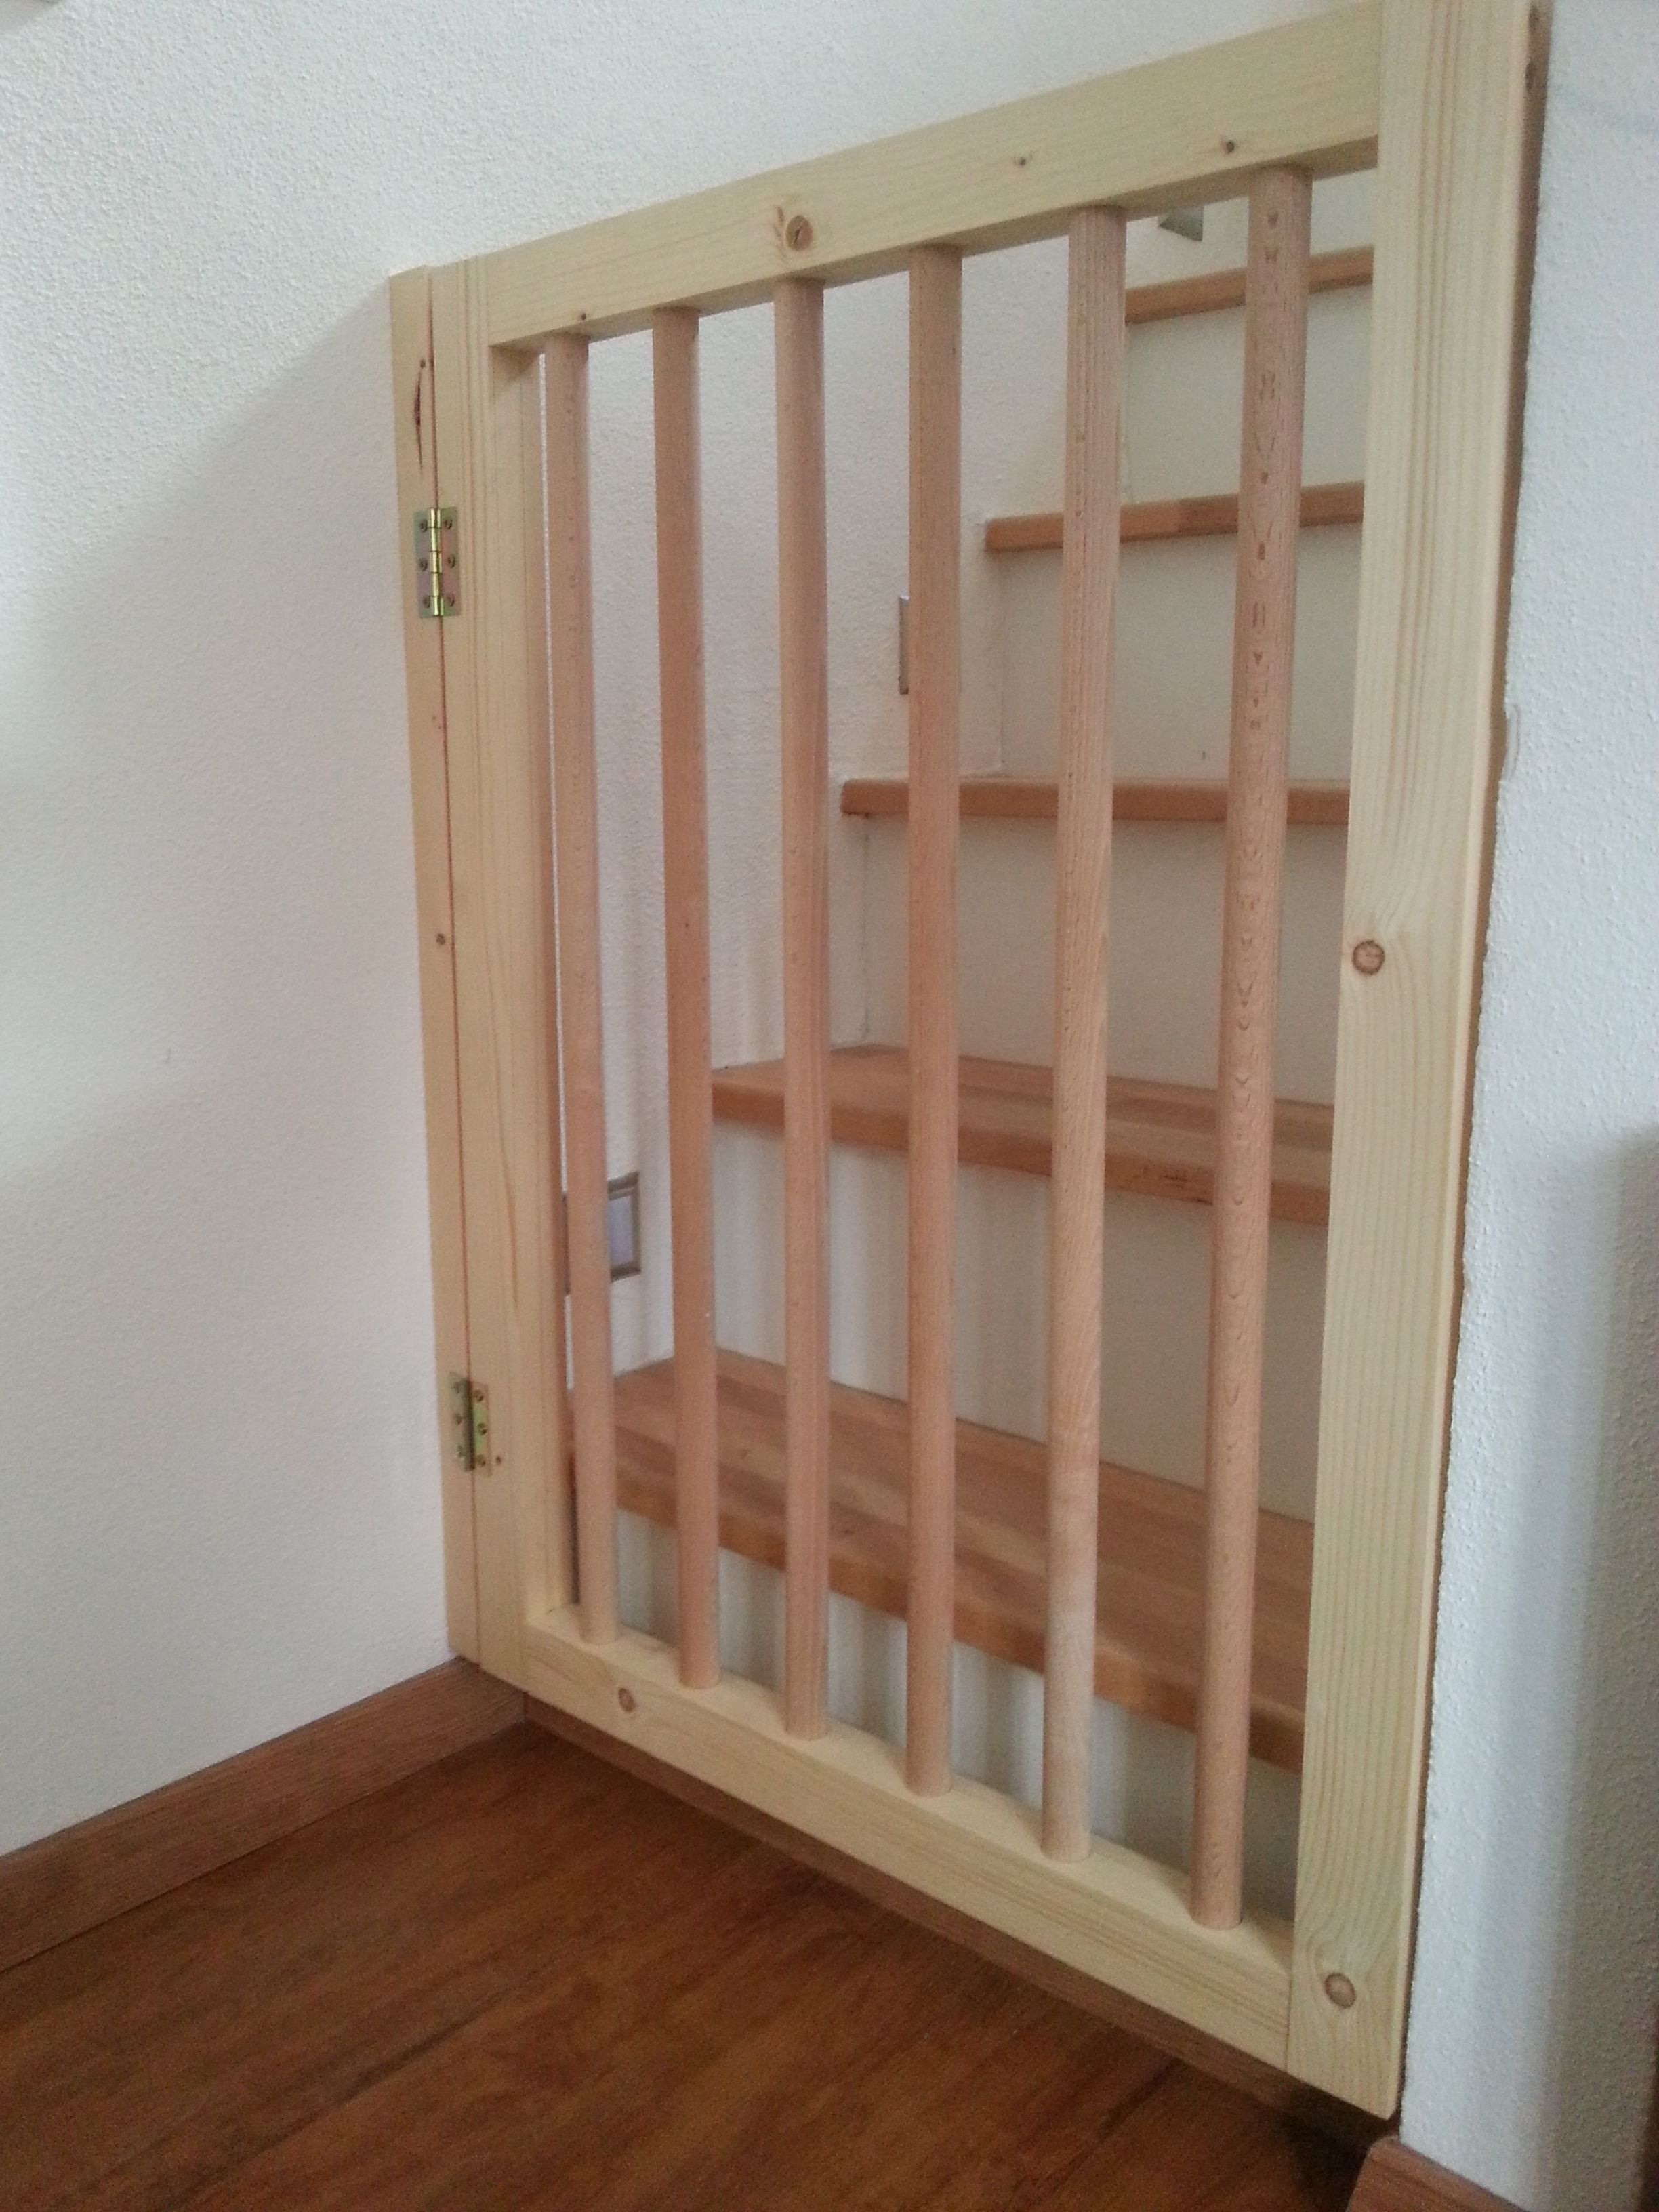 babybett selber bauen mit bauplan. Black Bedroom Furniture Sets. Home Design Ideas